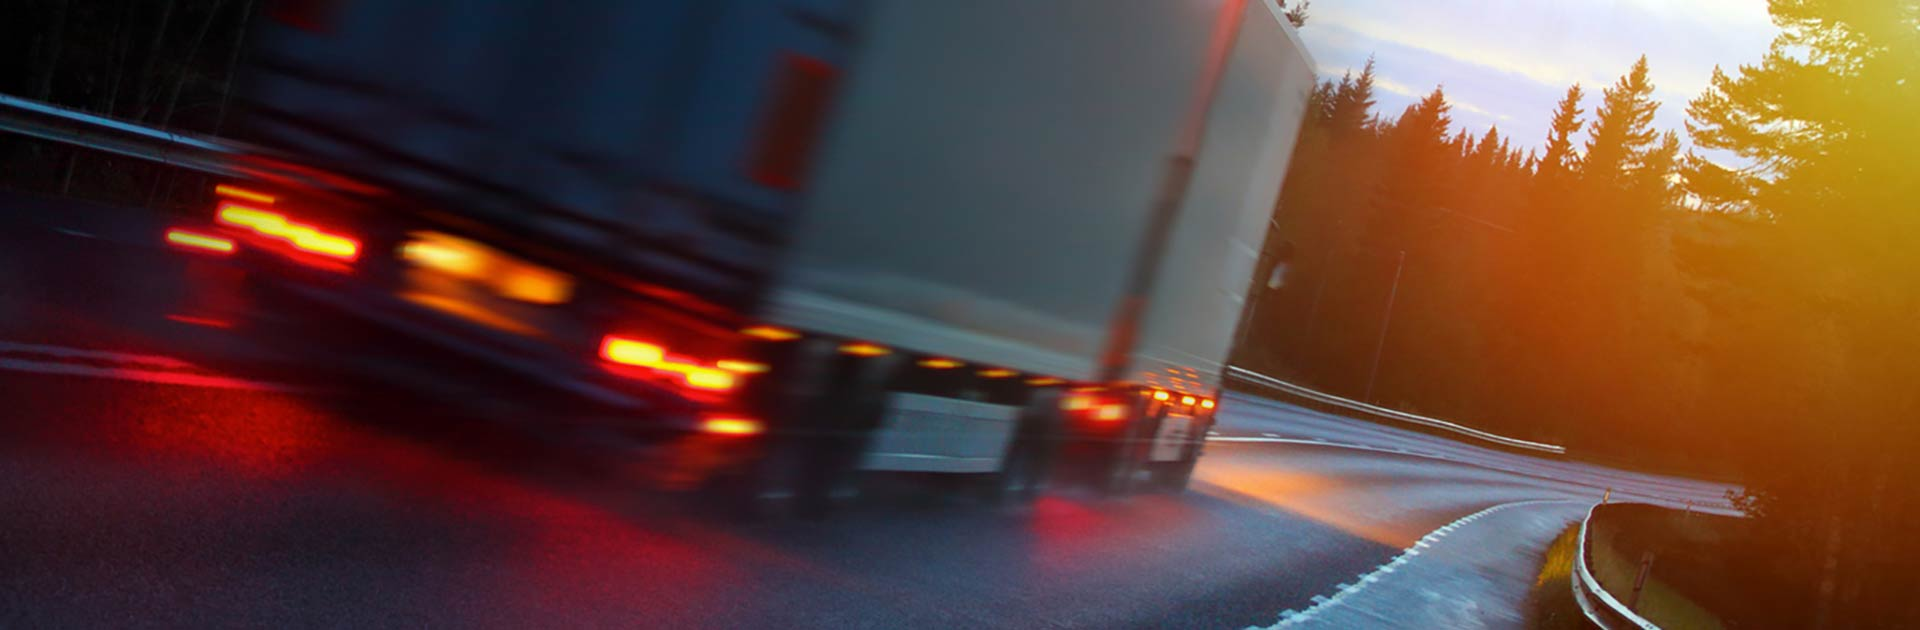 Global Service Varese servizi agli autotrasportatori